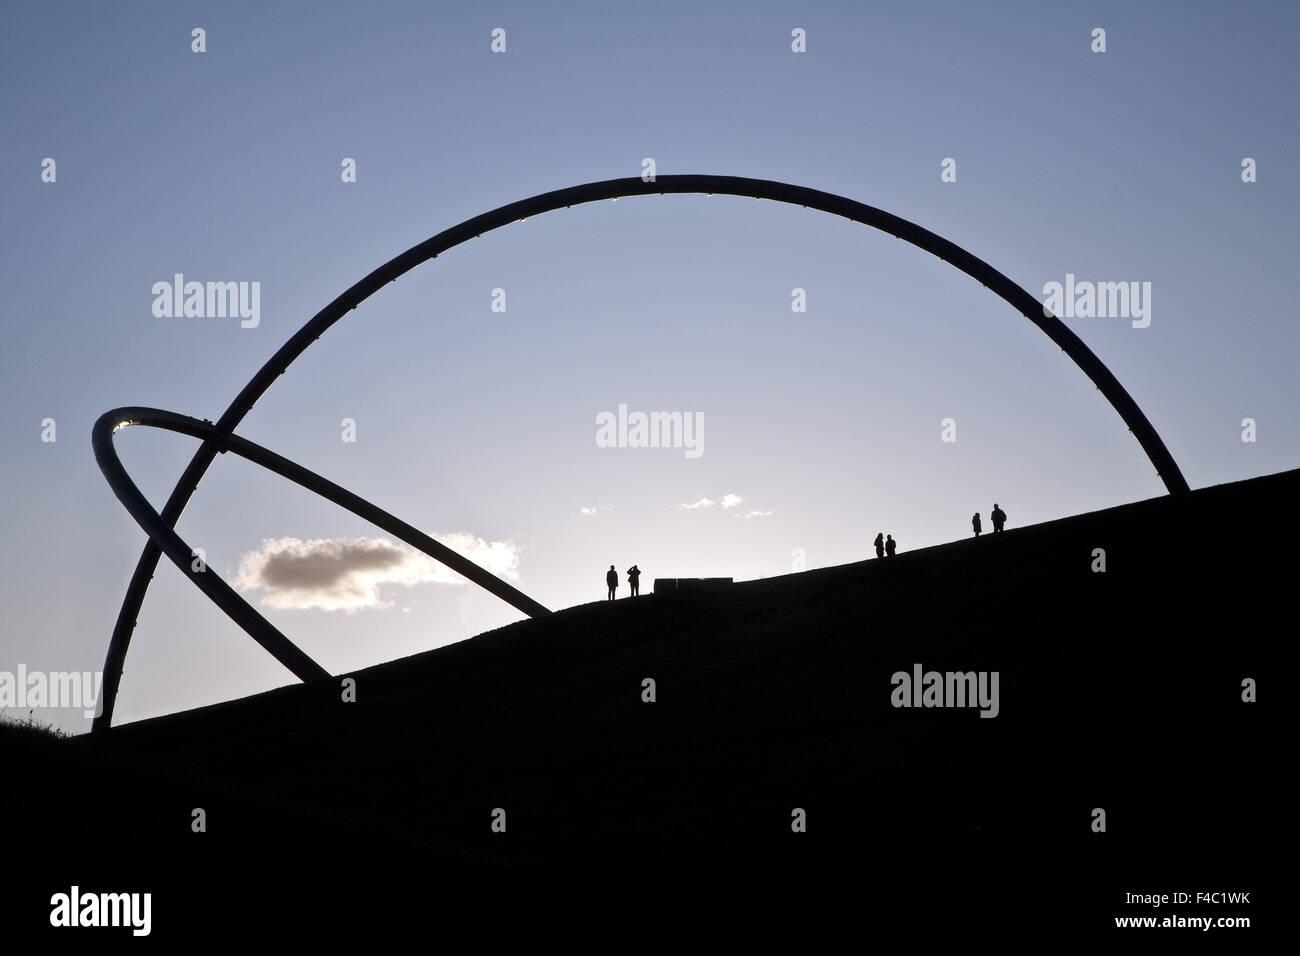 Observatoire de l'horizon, Hoheward, Herten, Allemagne Photo Stock